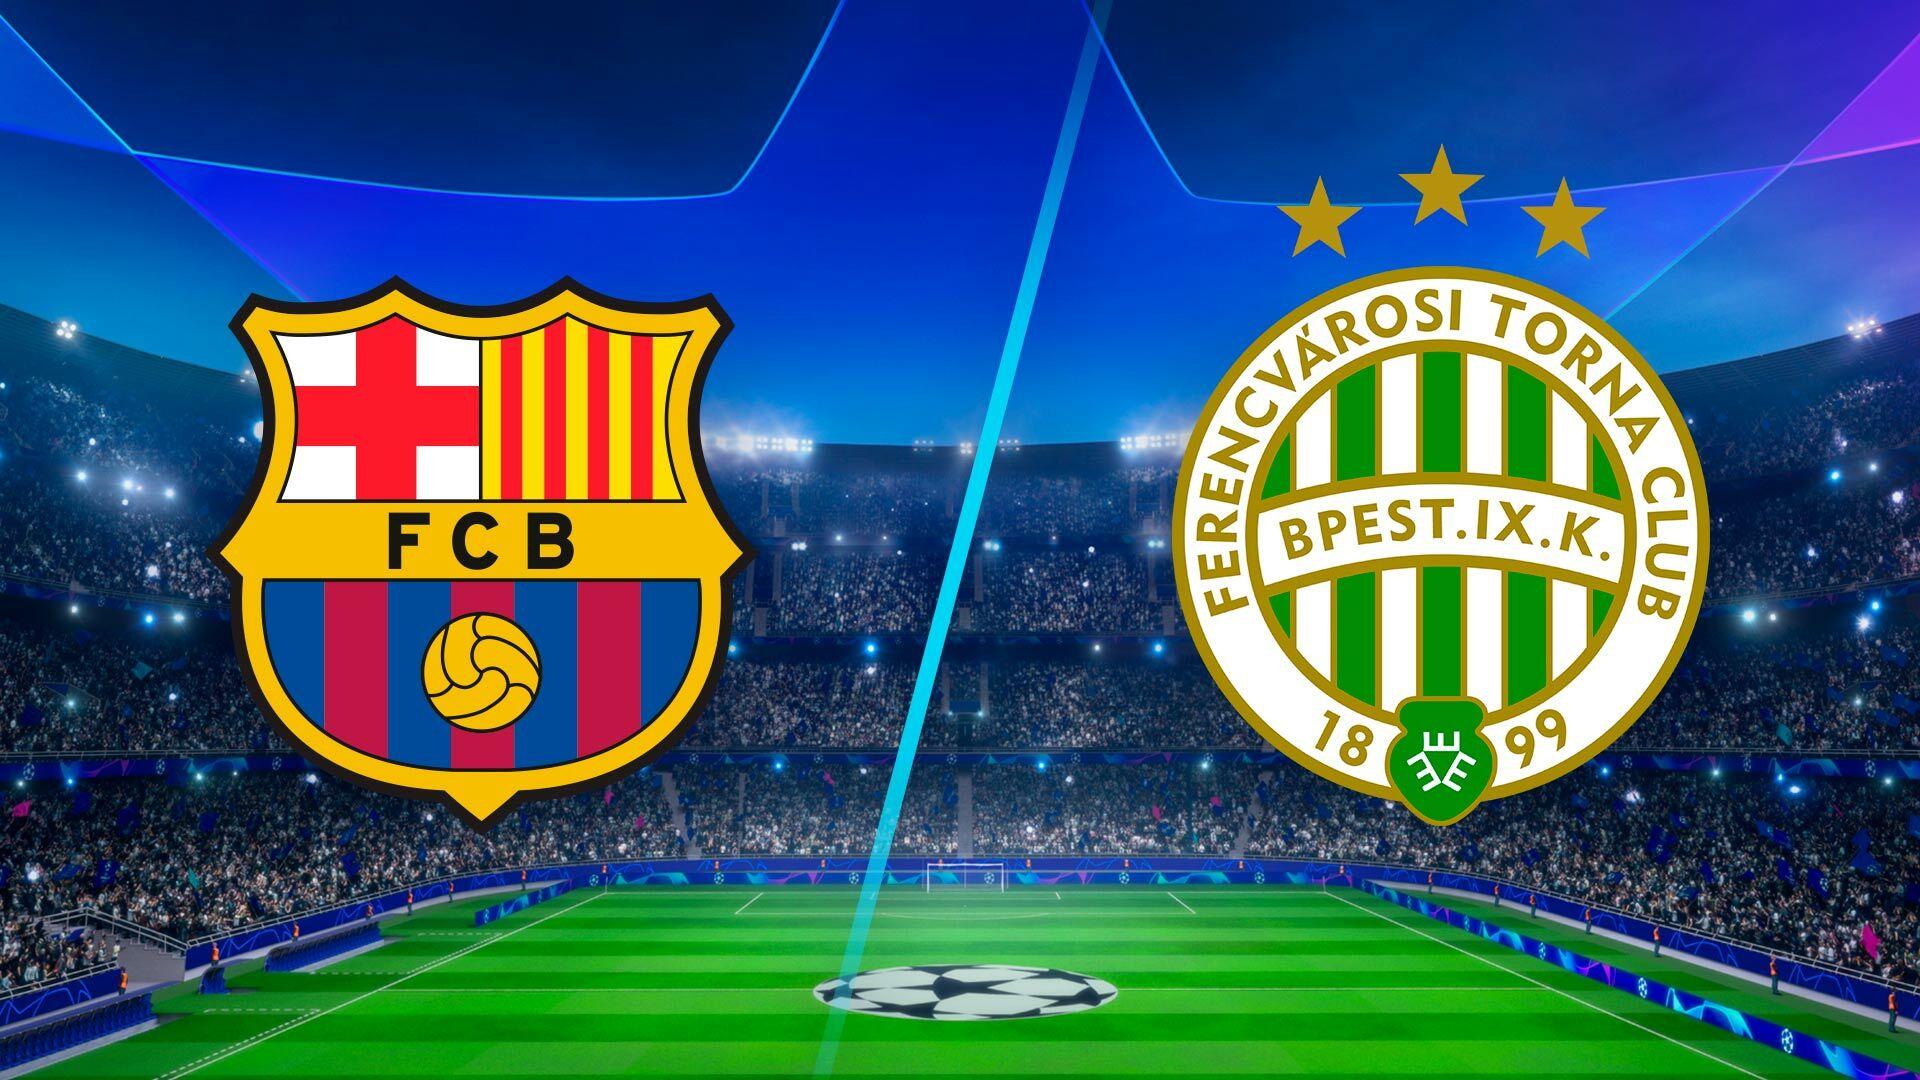 watch uefa champions league season 2021 episode 18 barcelona vs ferencvaros full show on paramount plus